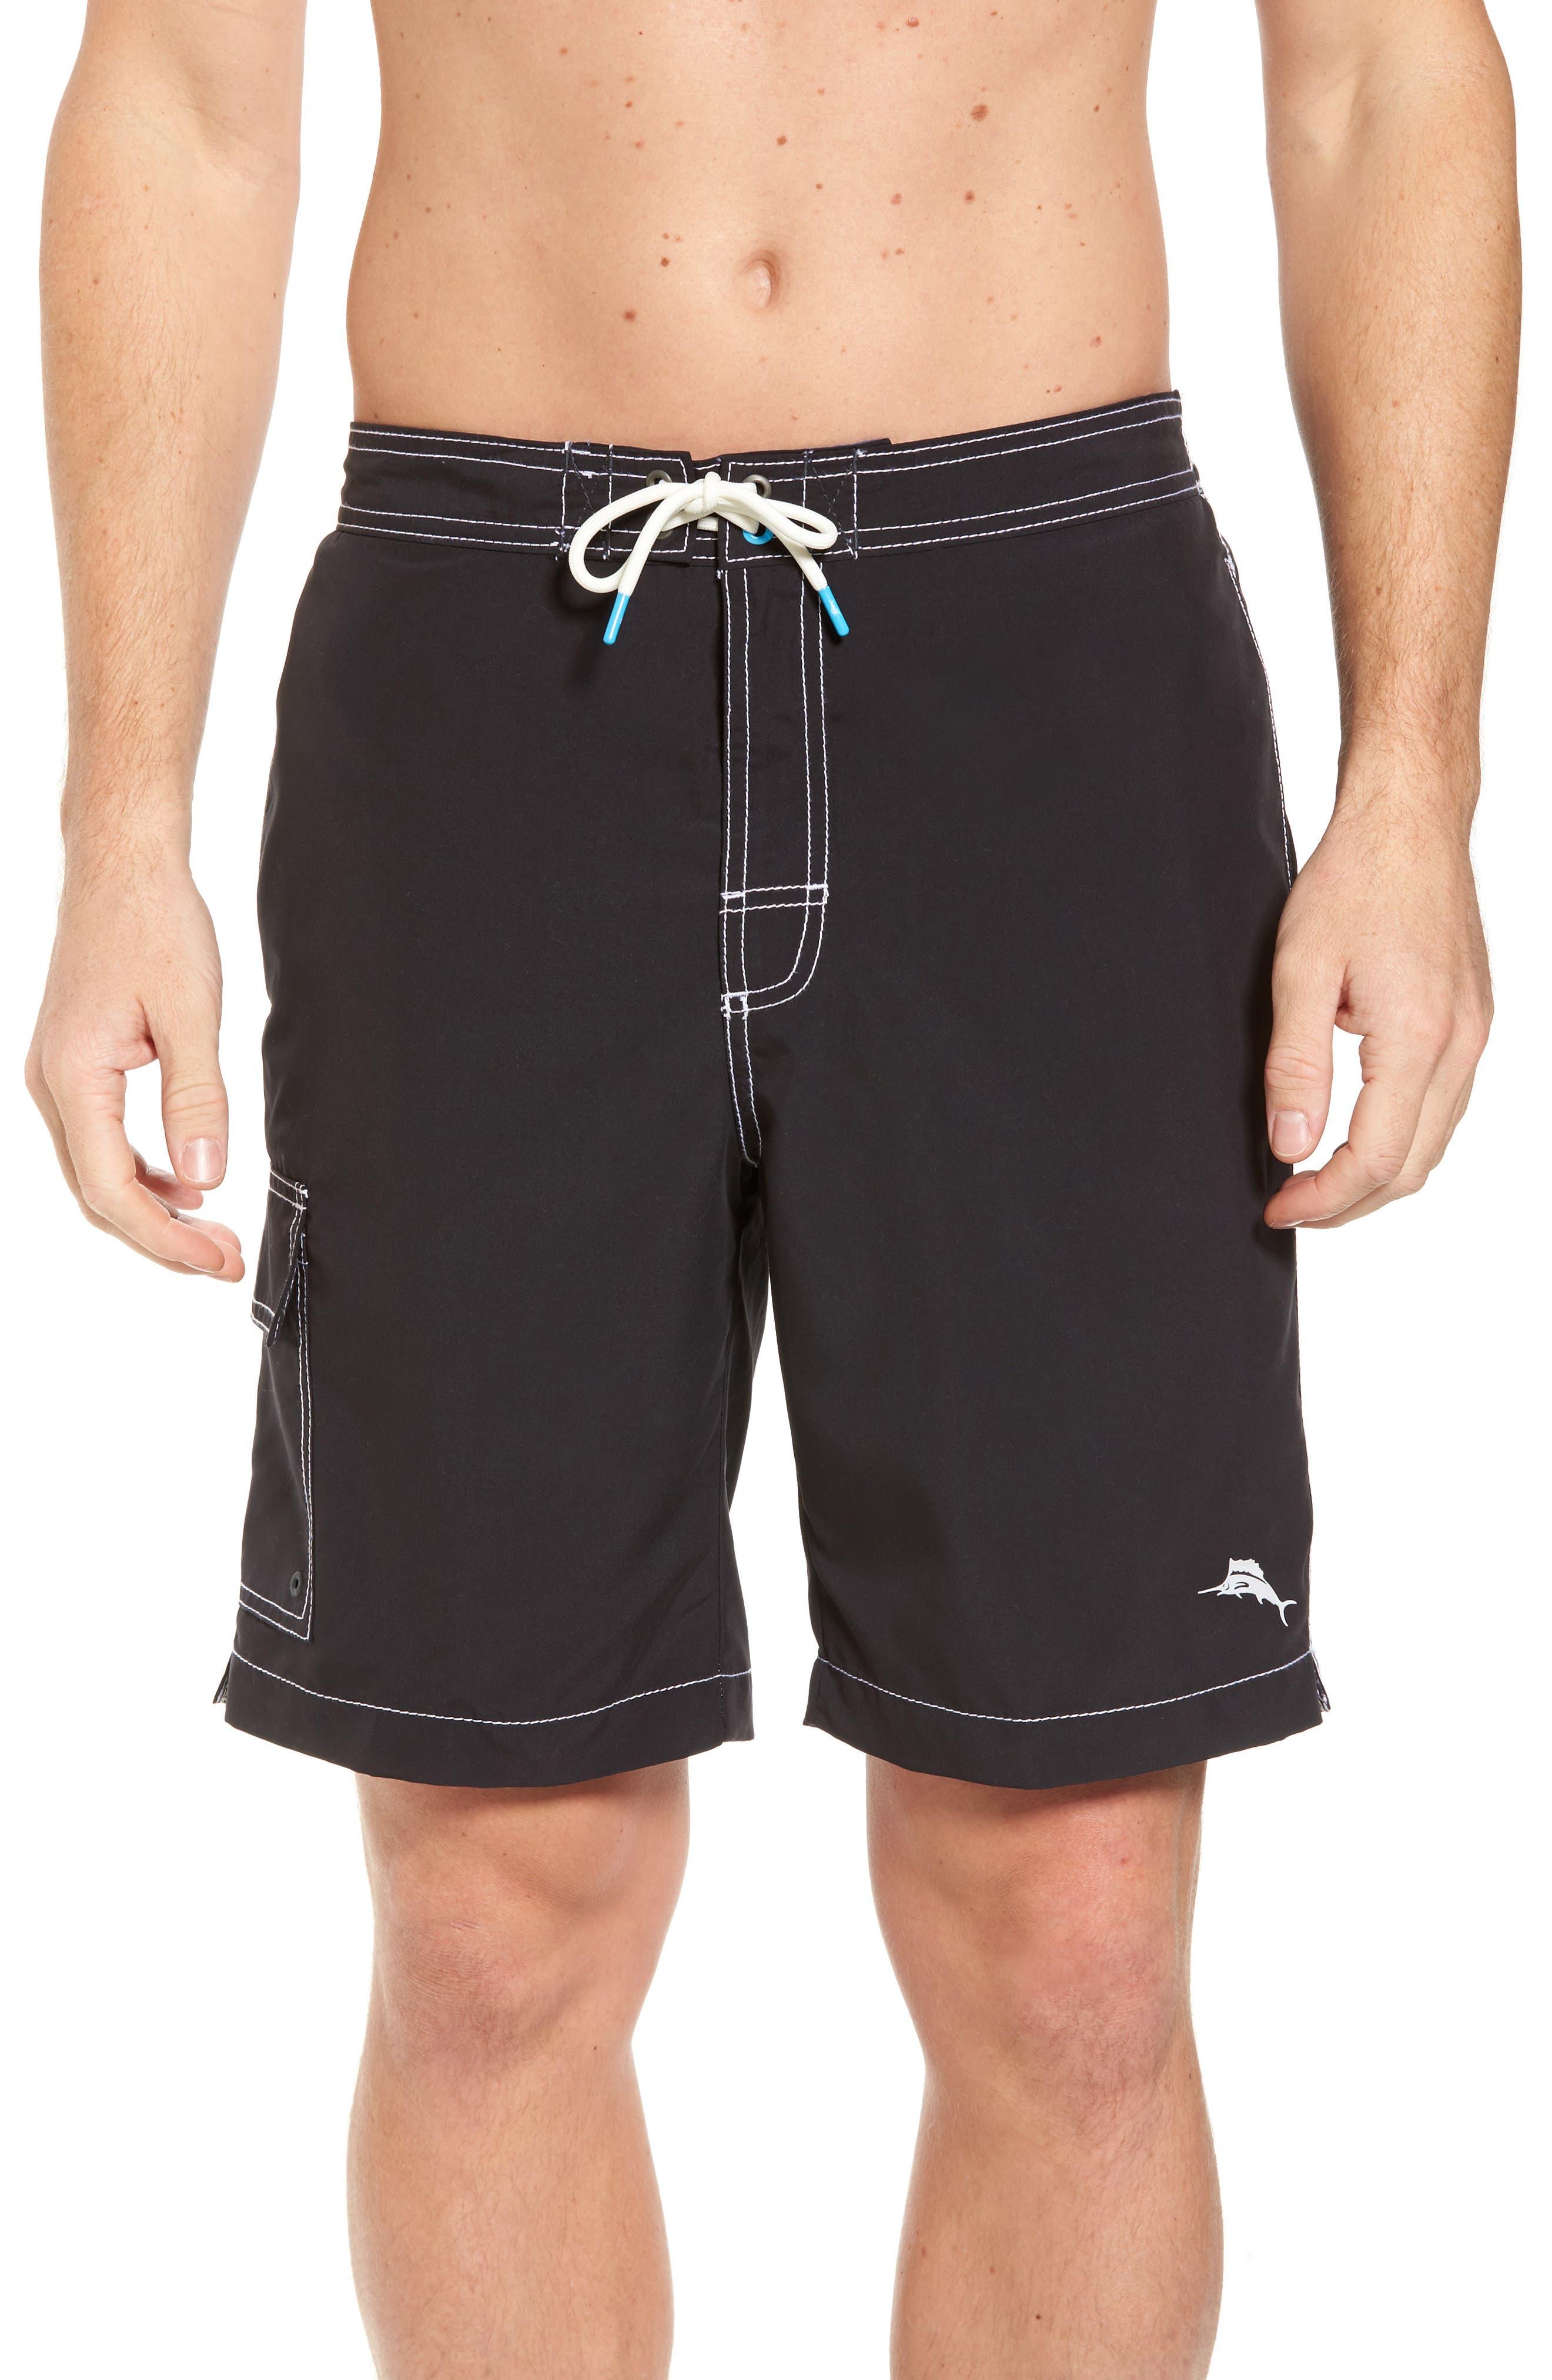 Baja Beach Board Shorts,                         Main,                         color, BLACK